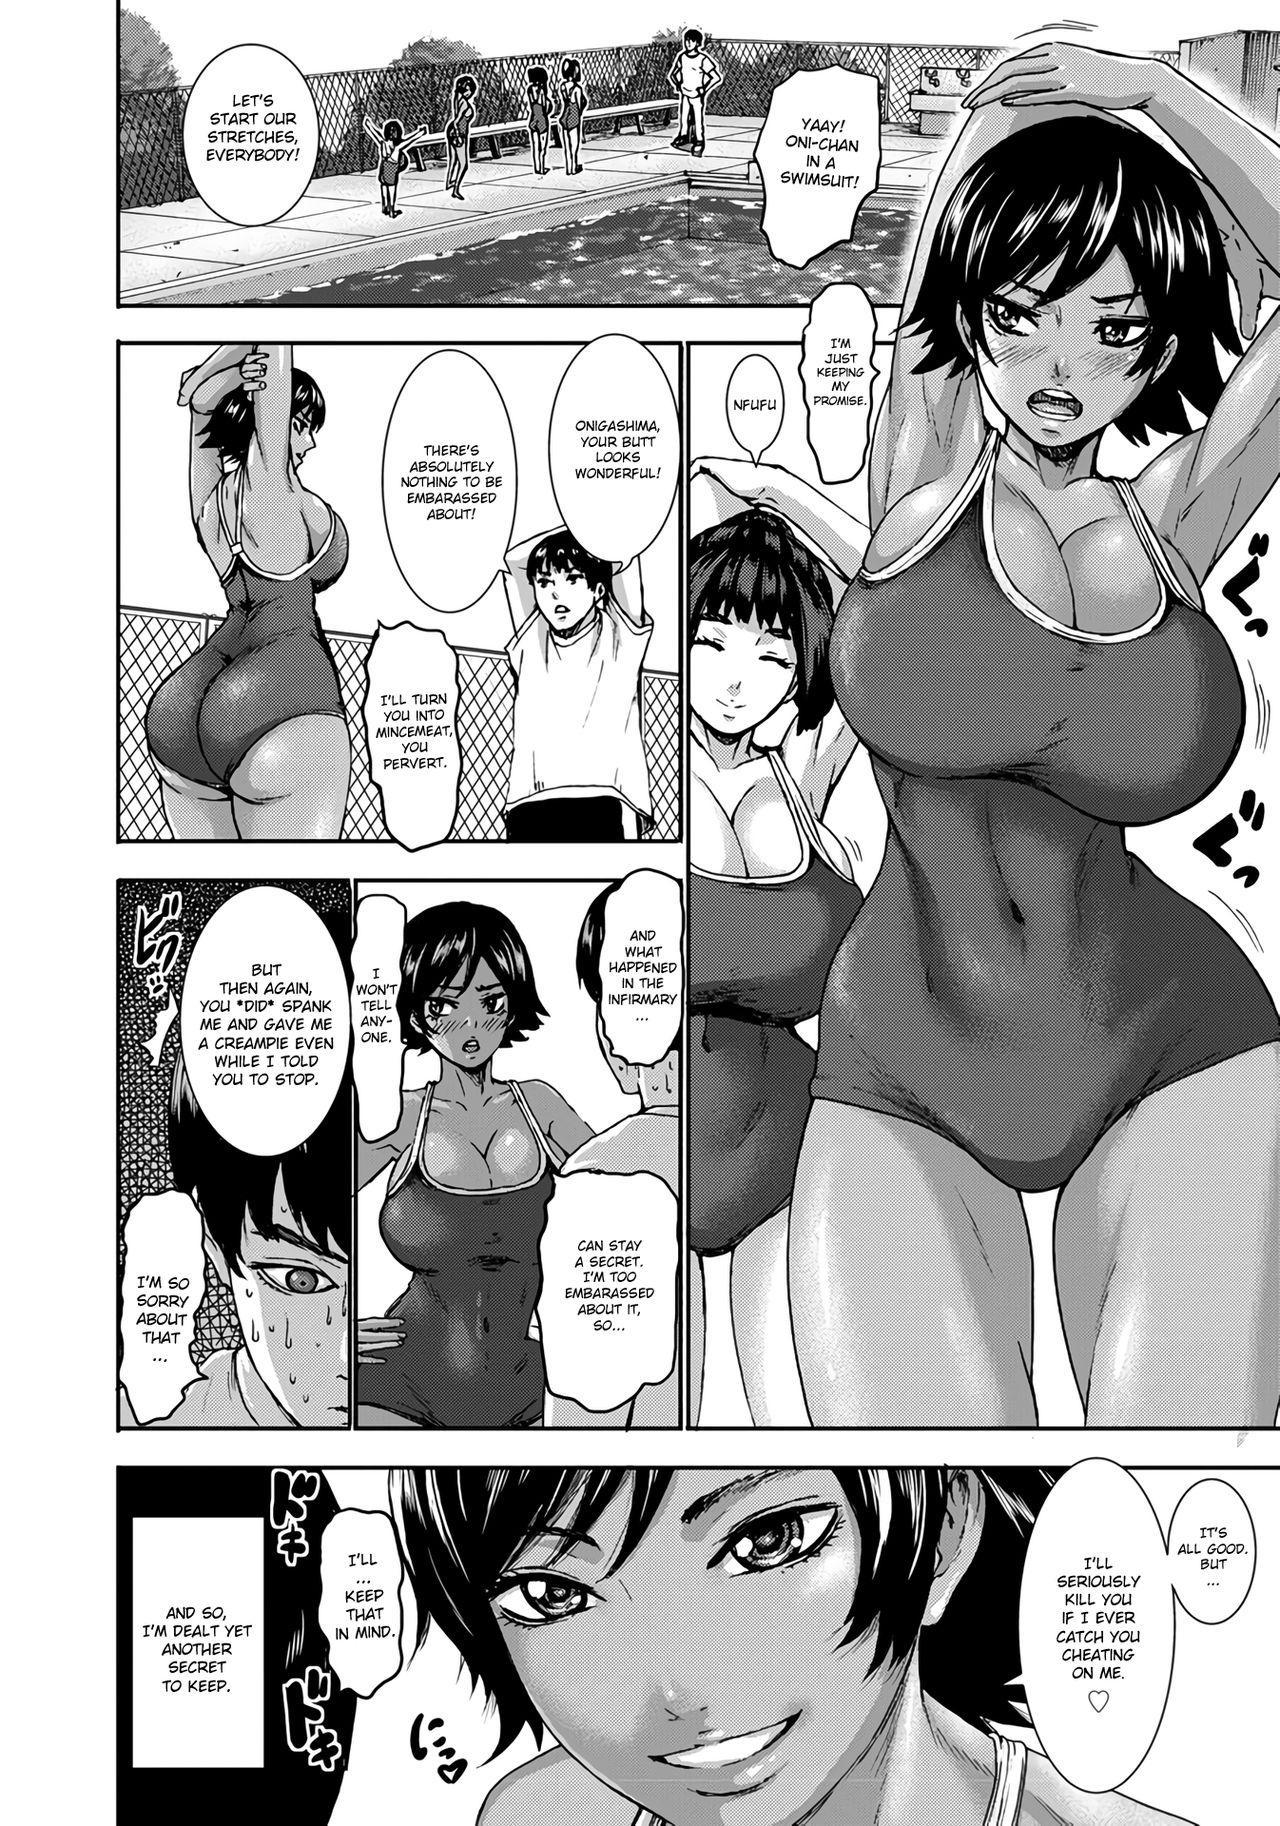 Chounyuu Gakuen | Academy For Huge Breasts Ch. 1-3 47